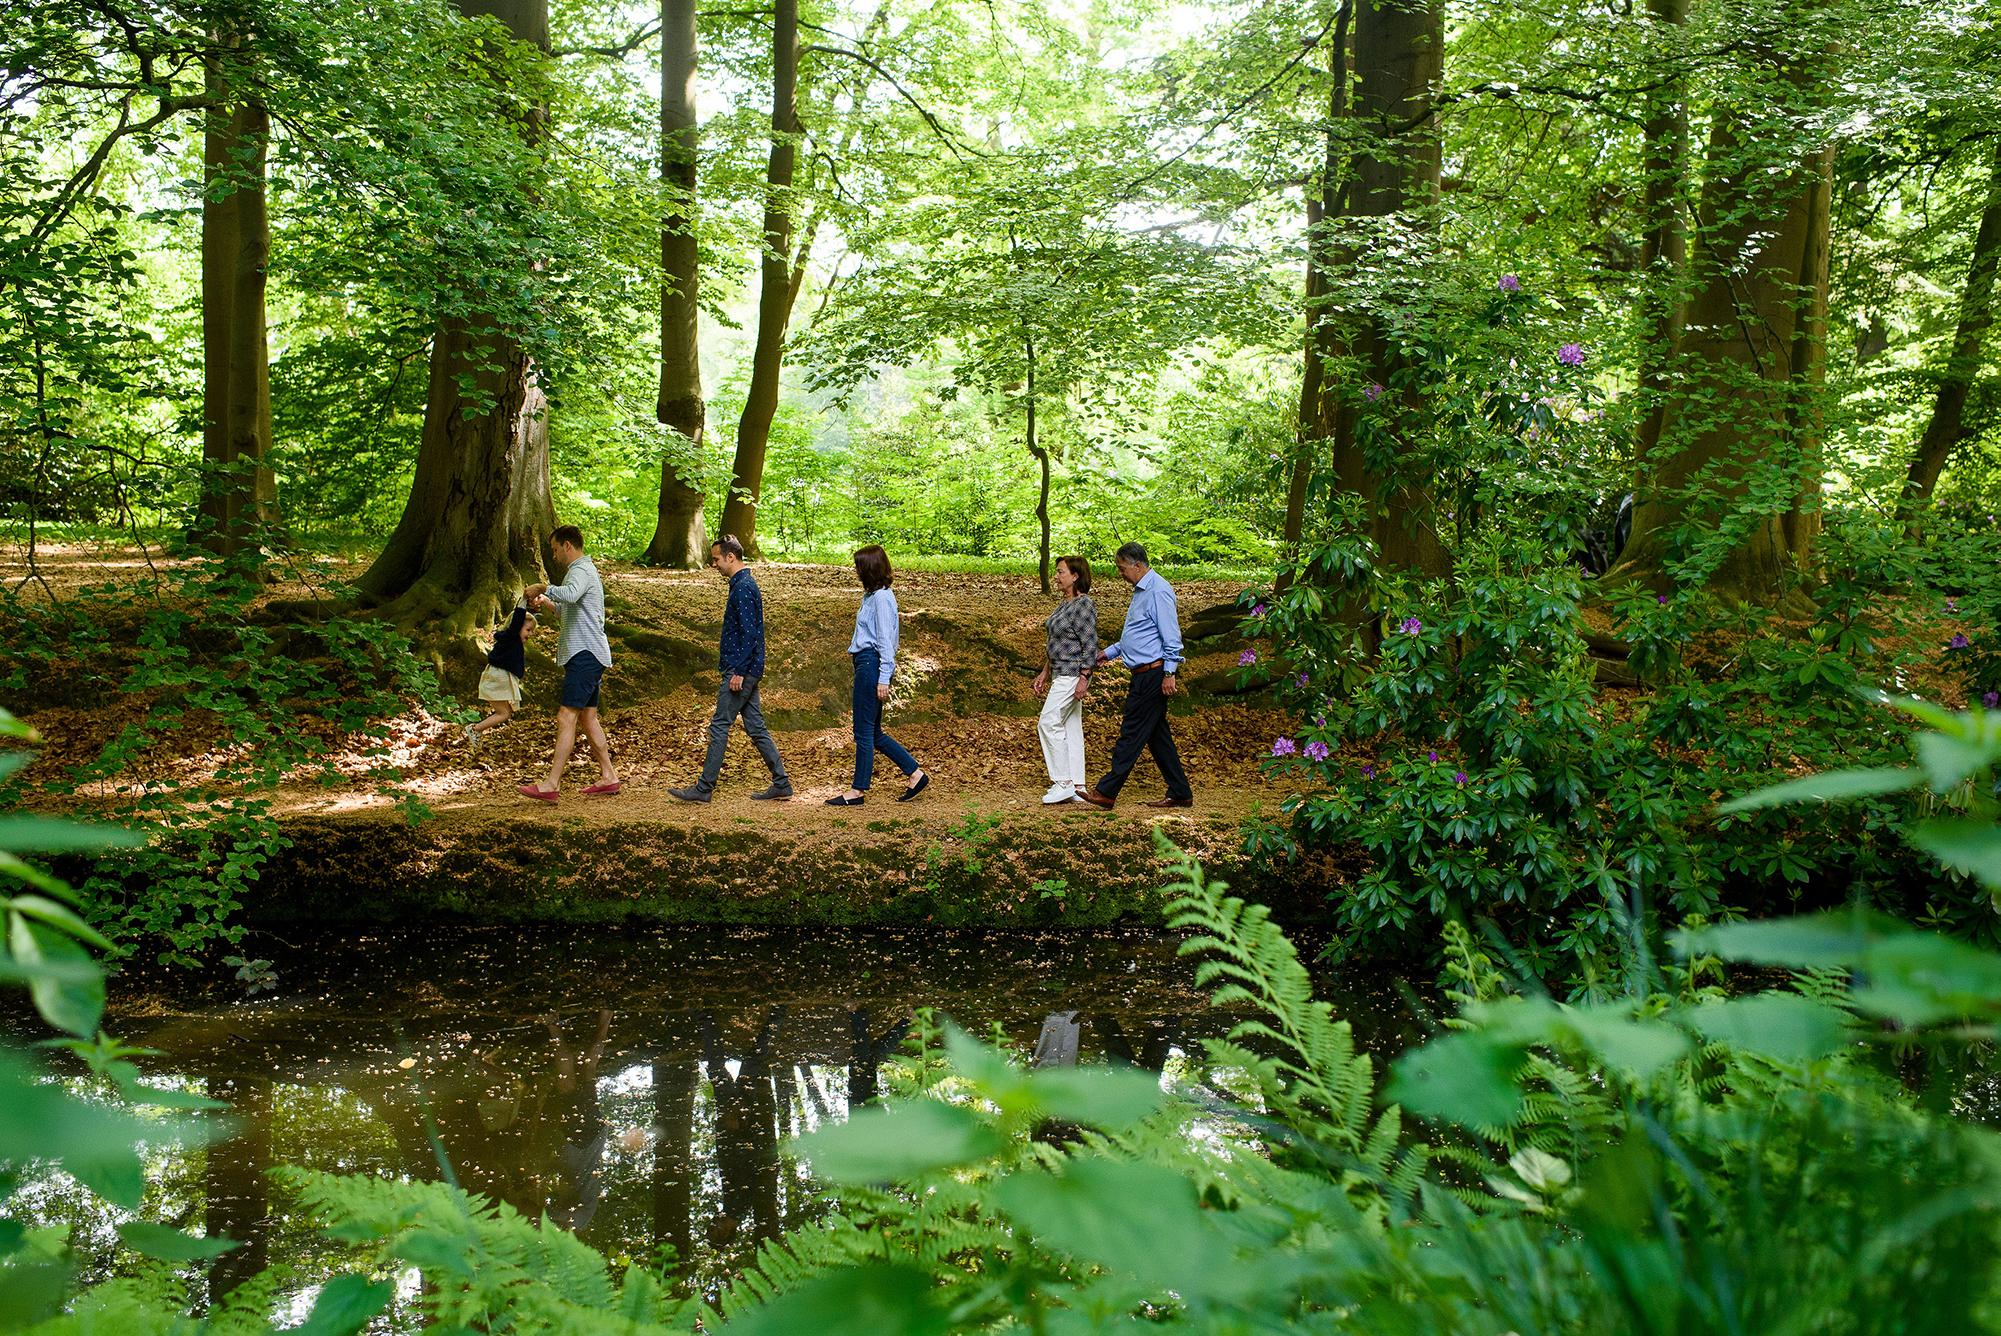 Familiewandeling in het bos